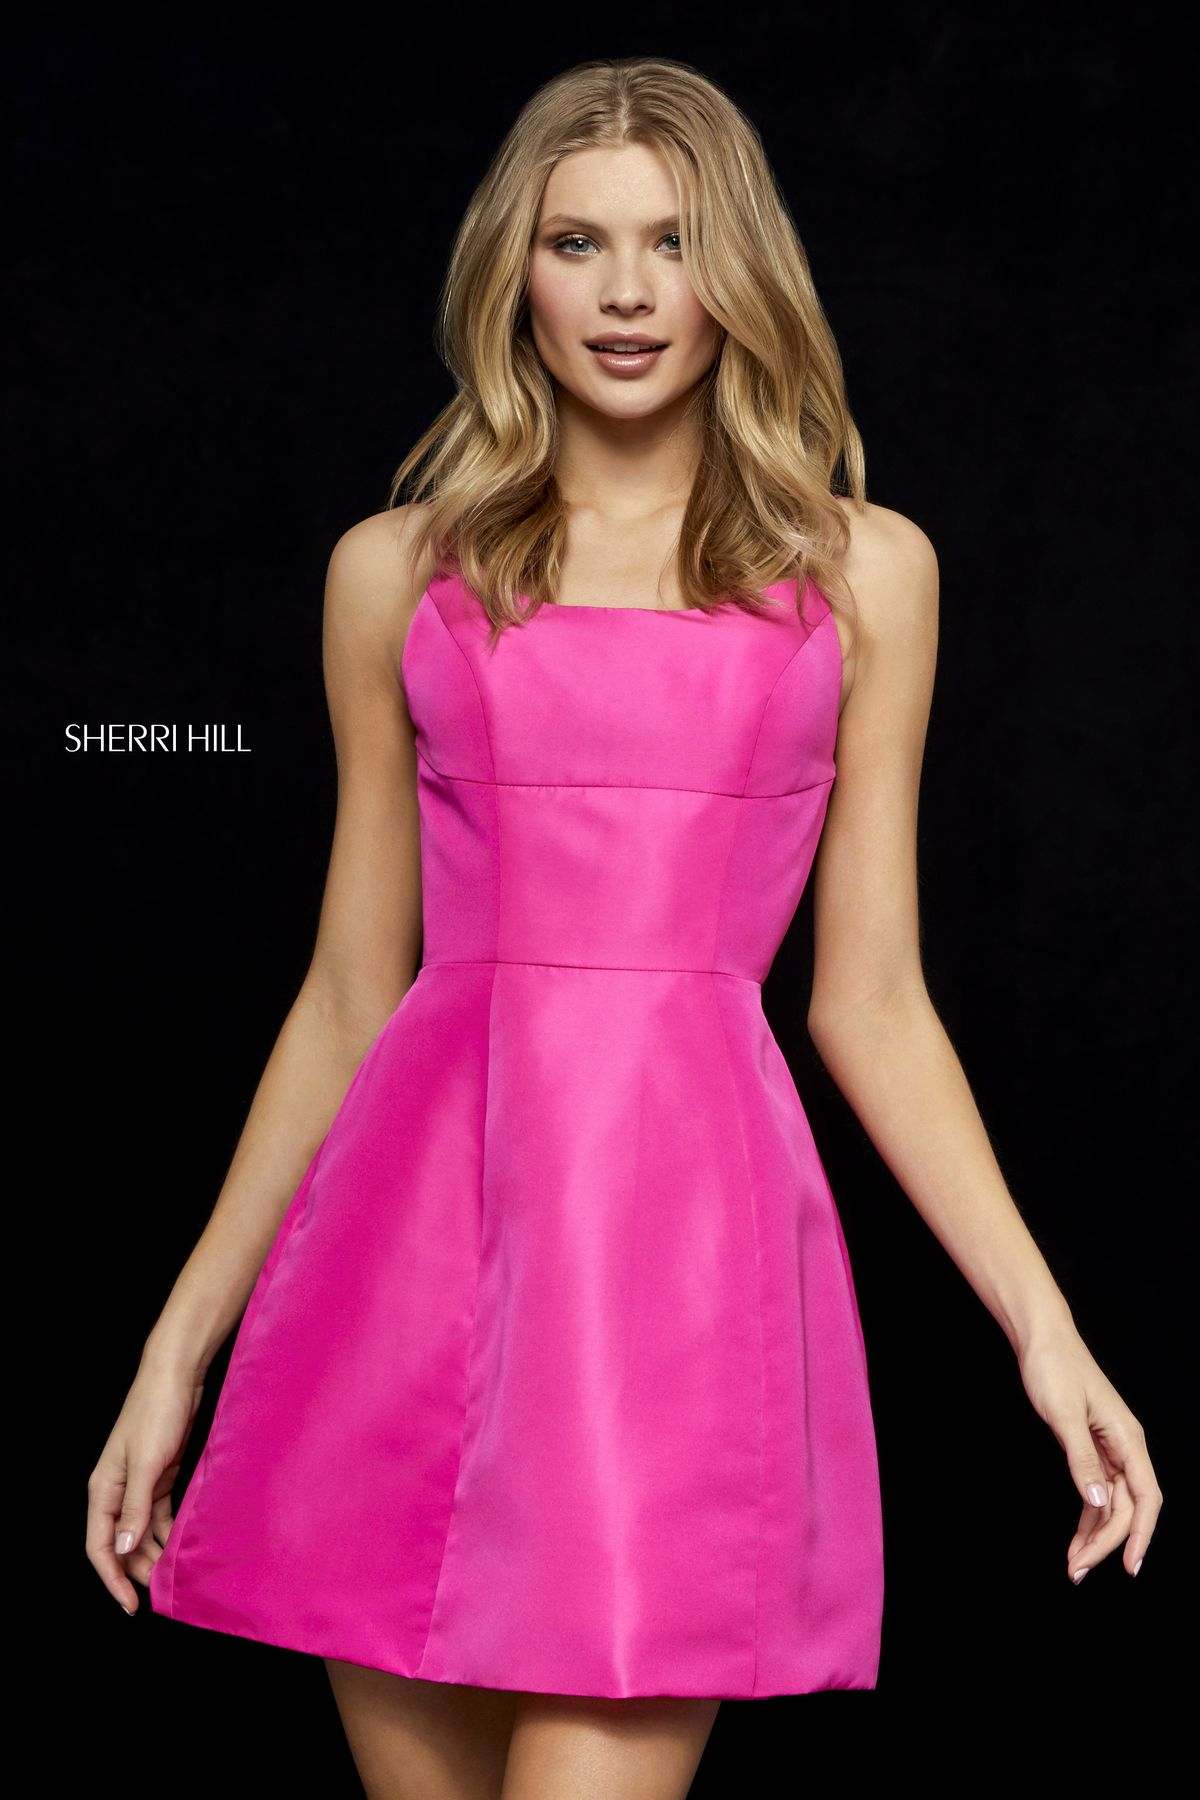 Style fall collection pinterest dresses sherri